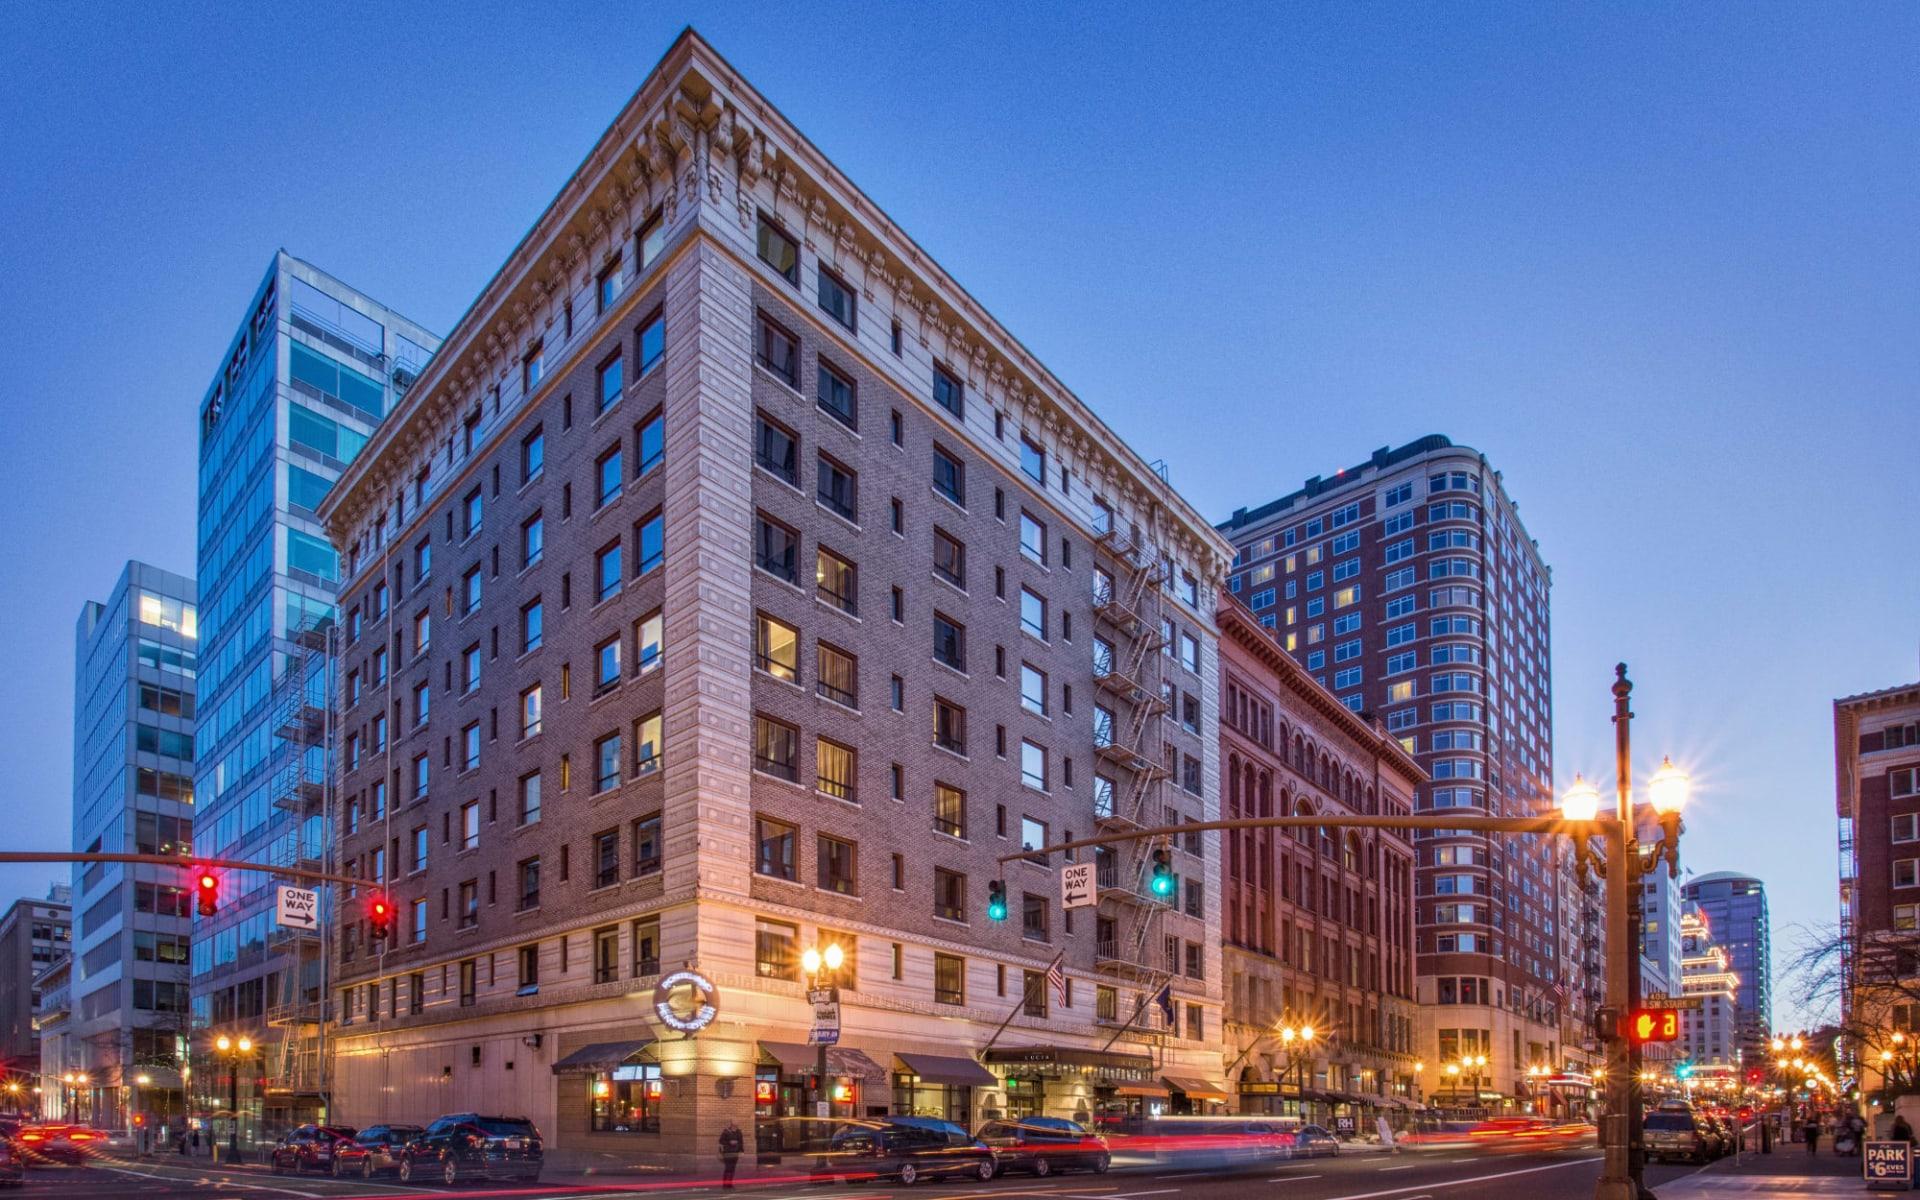 Hotel Lucia in Portland: Exterior__Hotel Lucia_Ausseansicht_Tourmappers